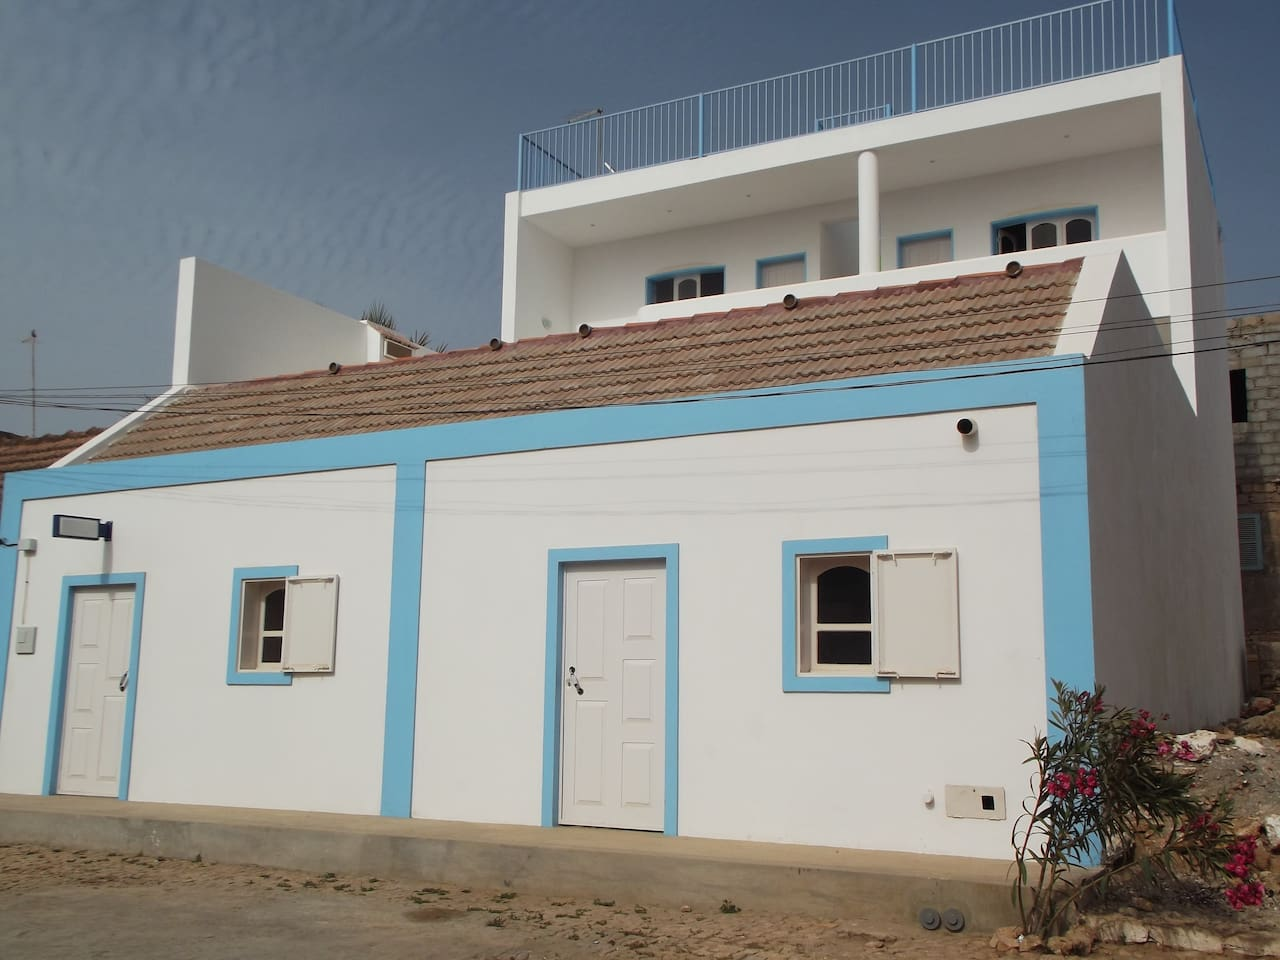 Kaza Tropikal - 4 guestrooms built above family residence